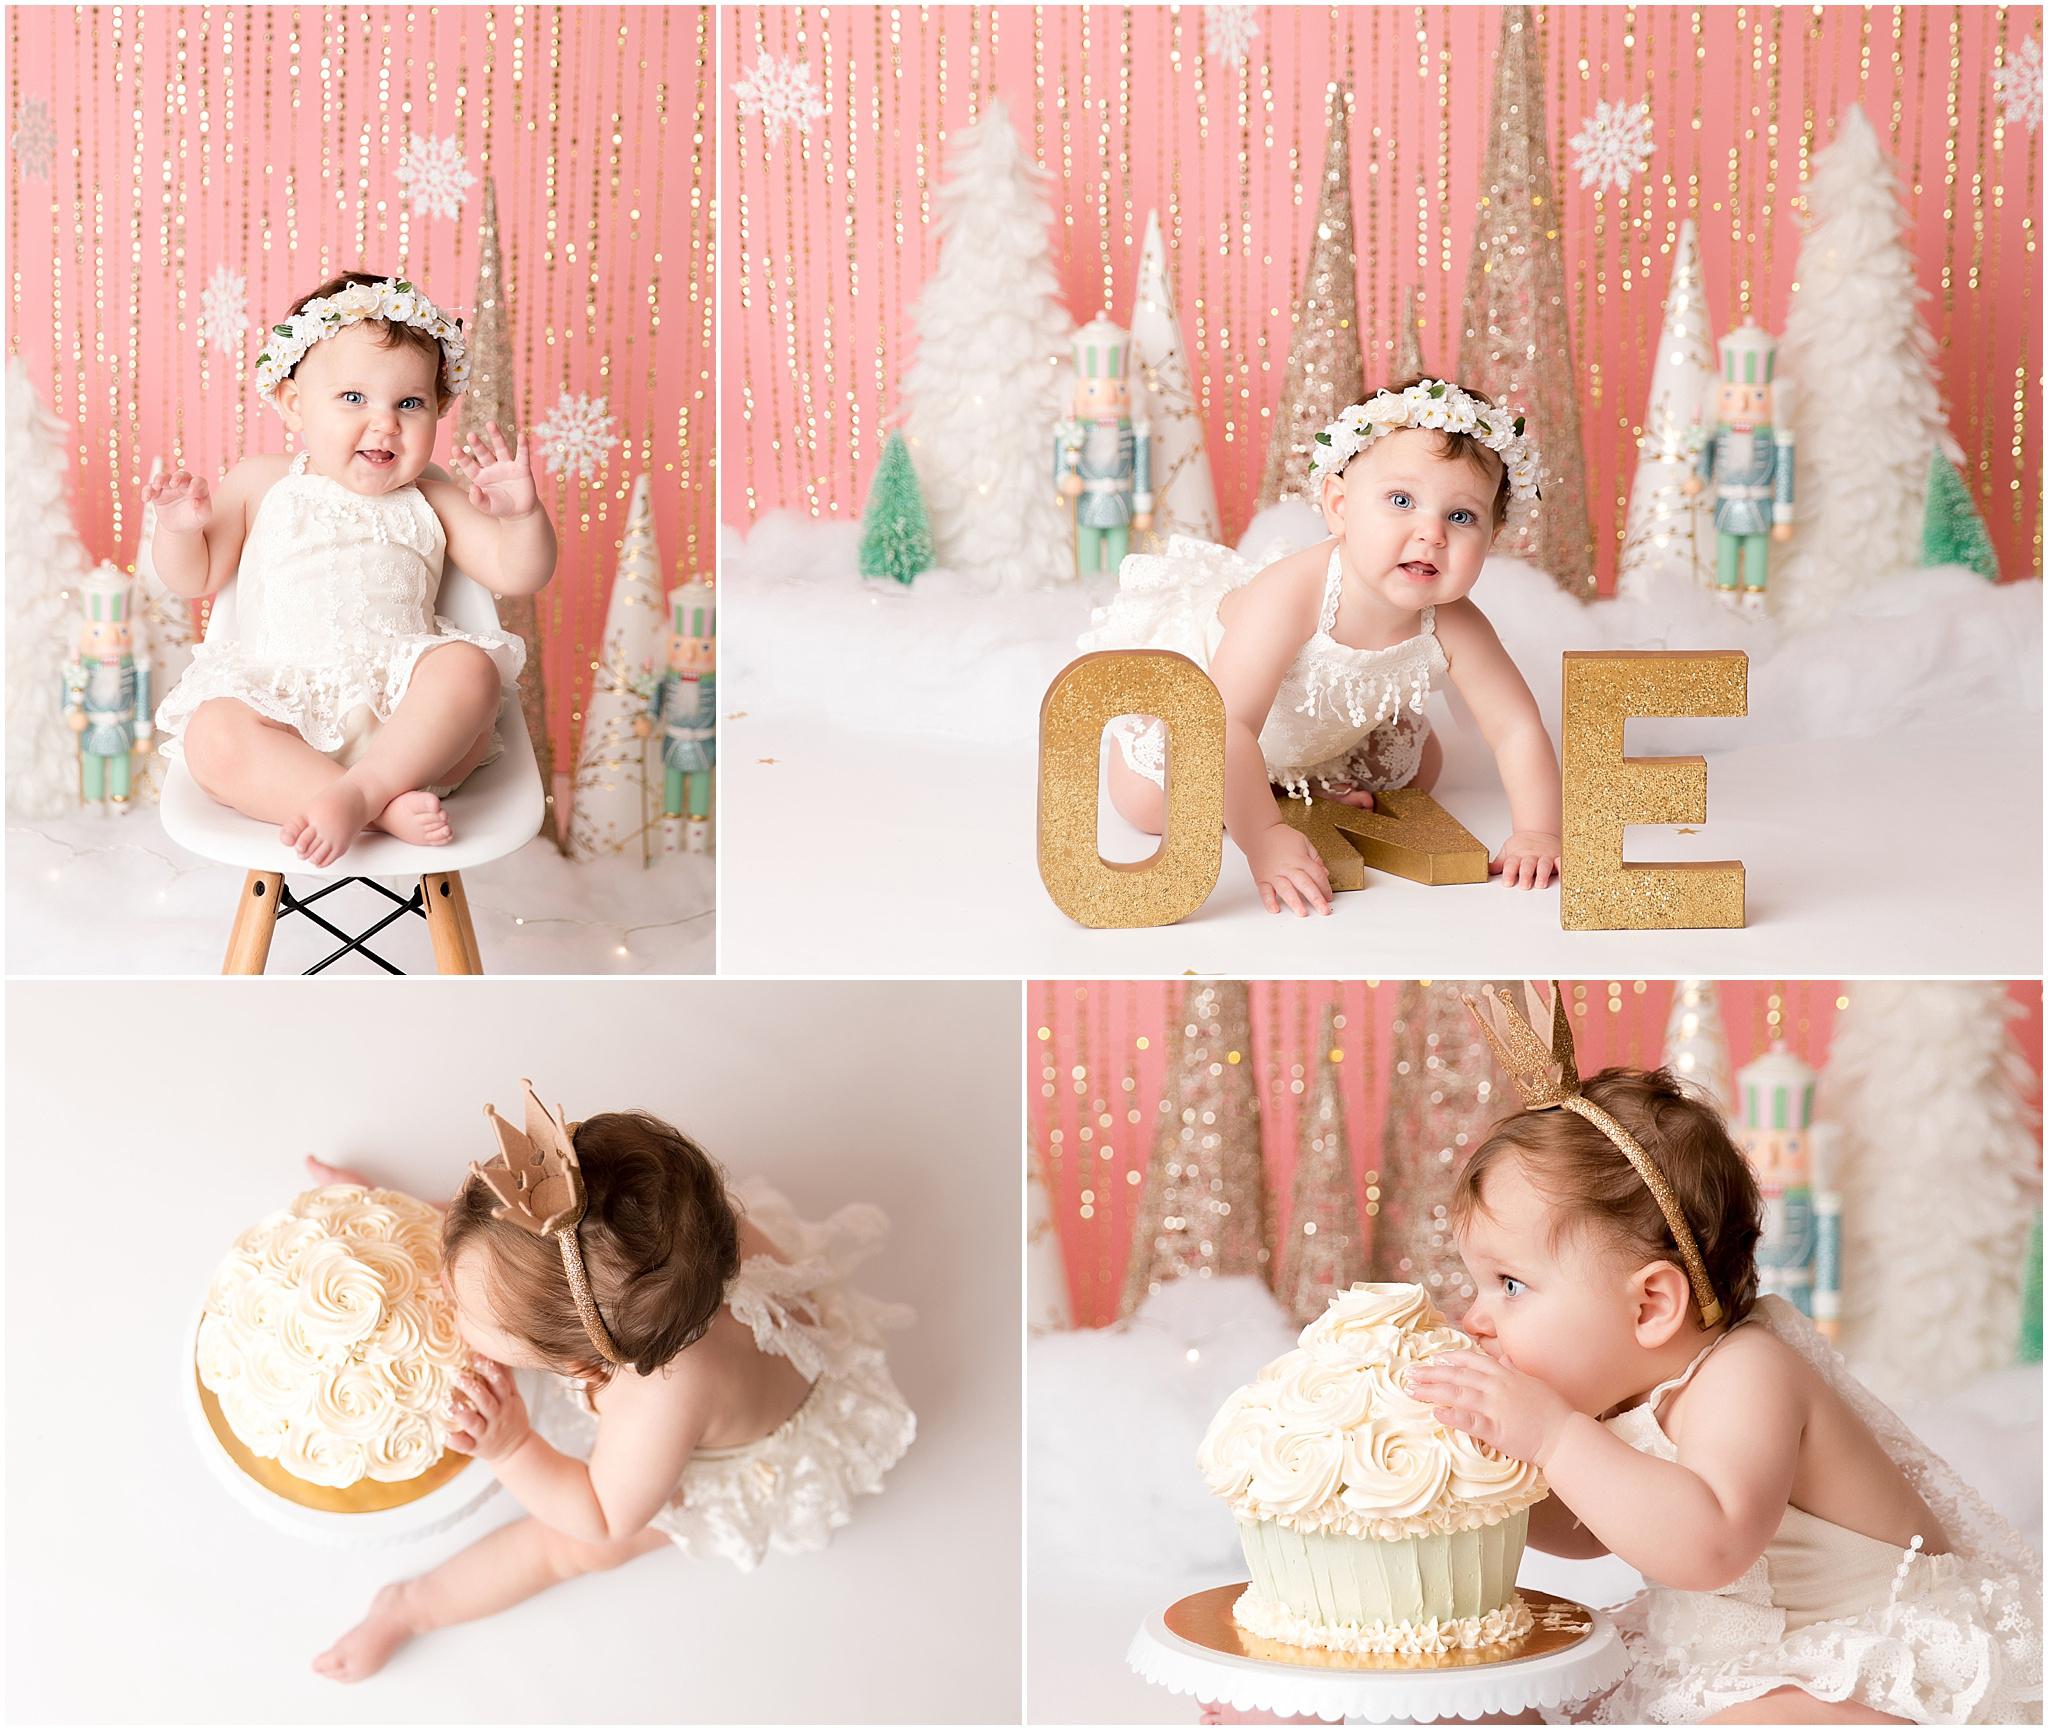 cakesmash+photography+Luciana+Golcman+NYC+35.jpg